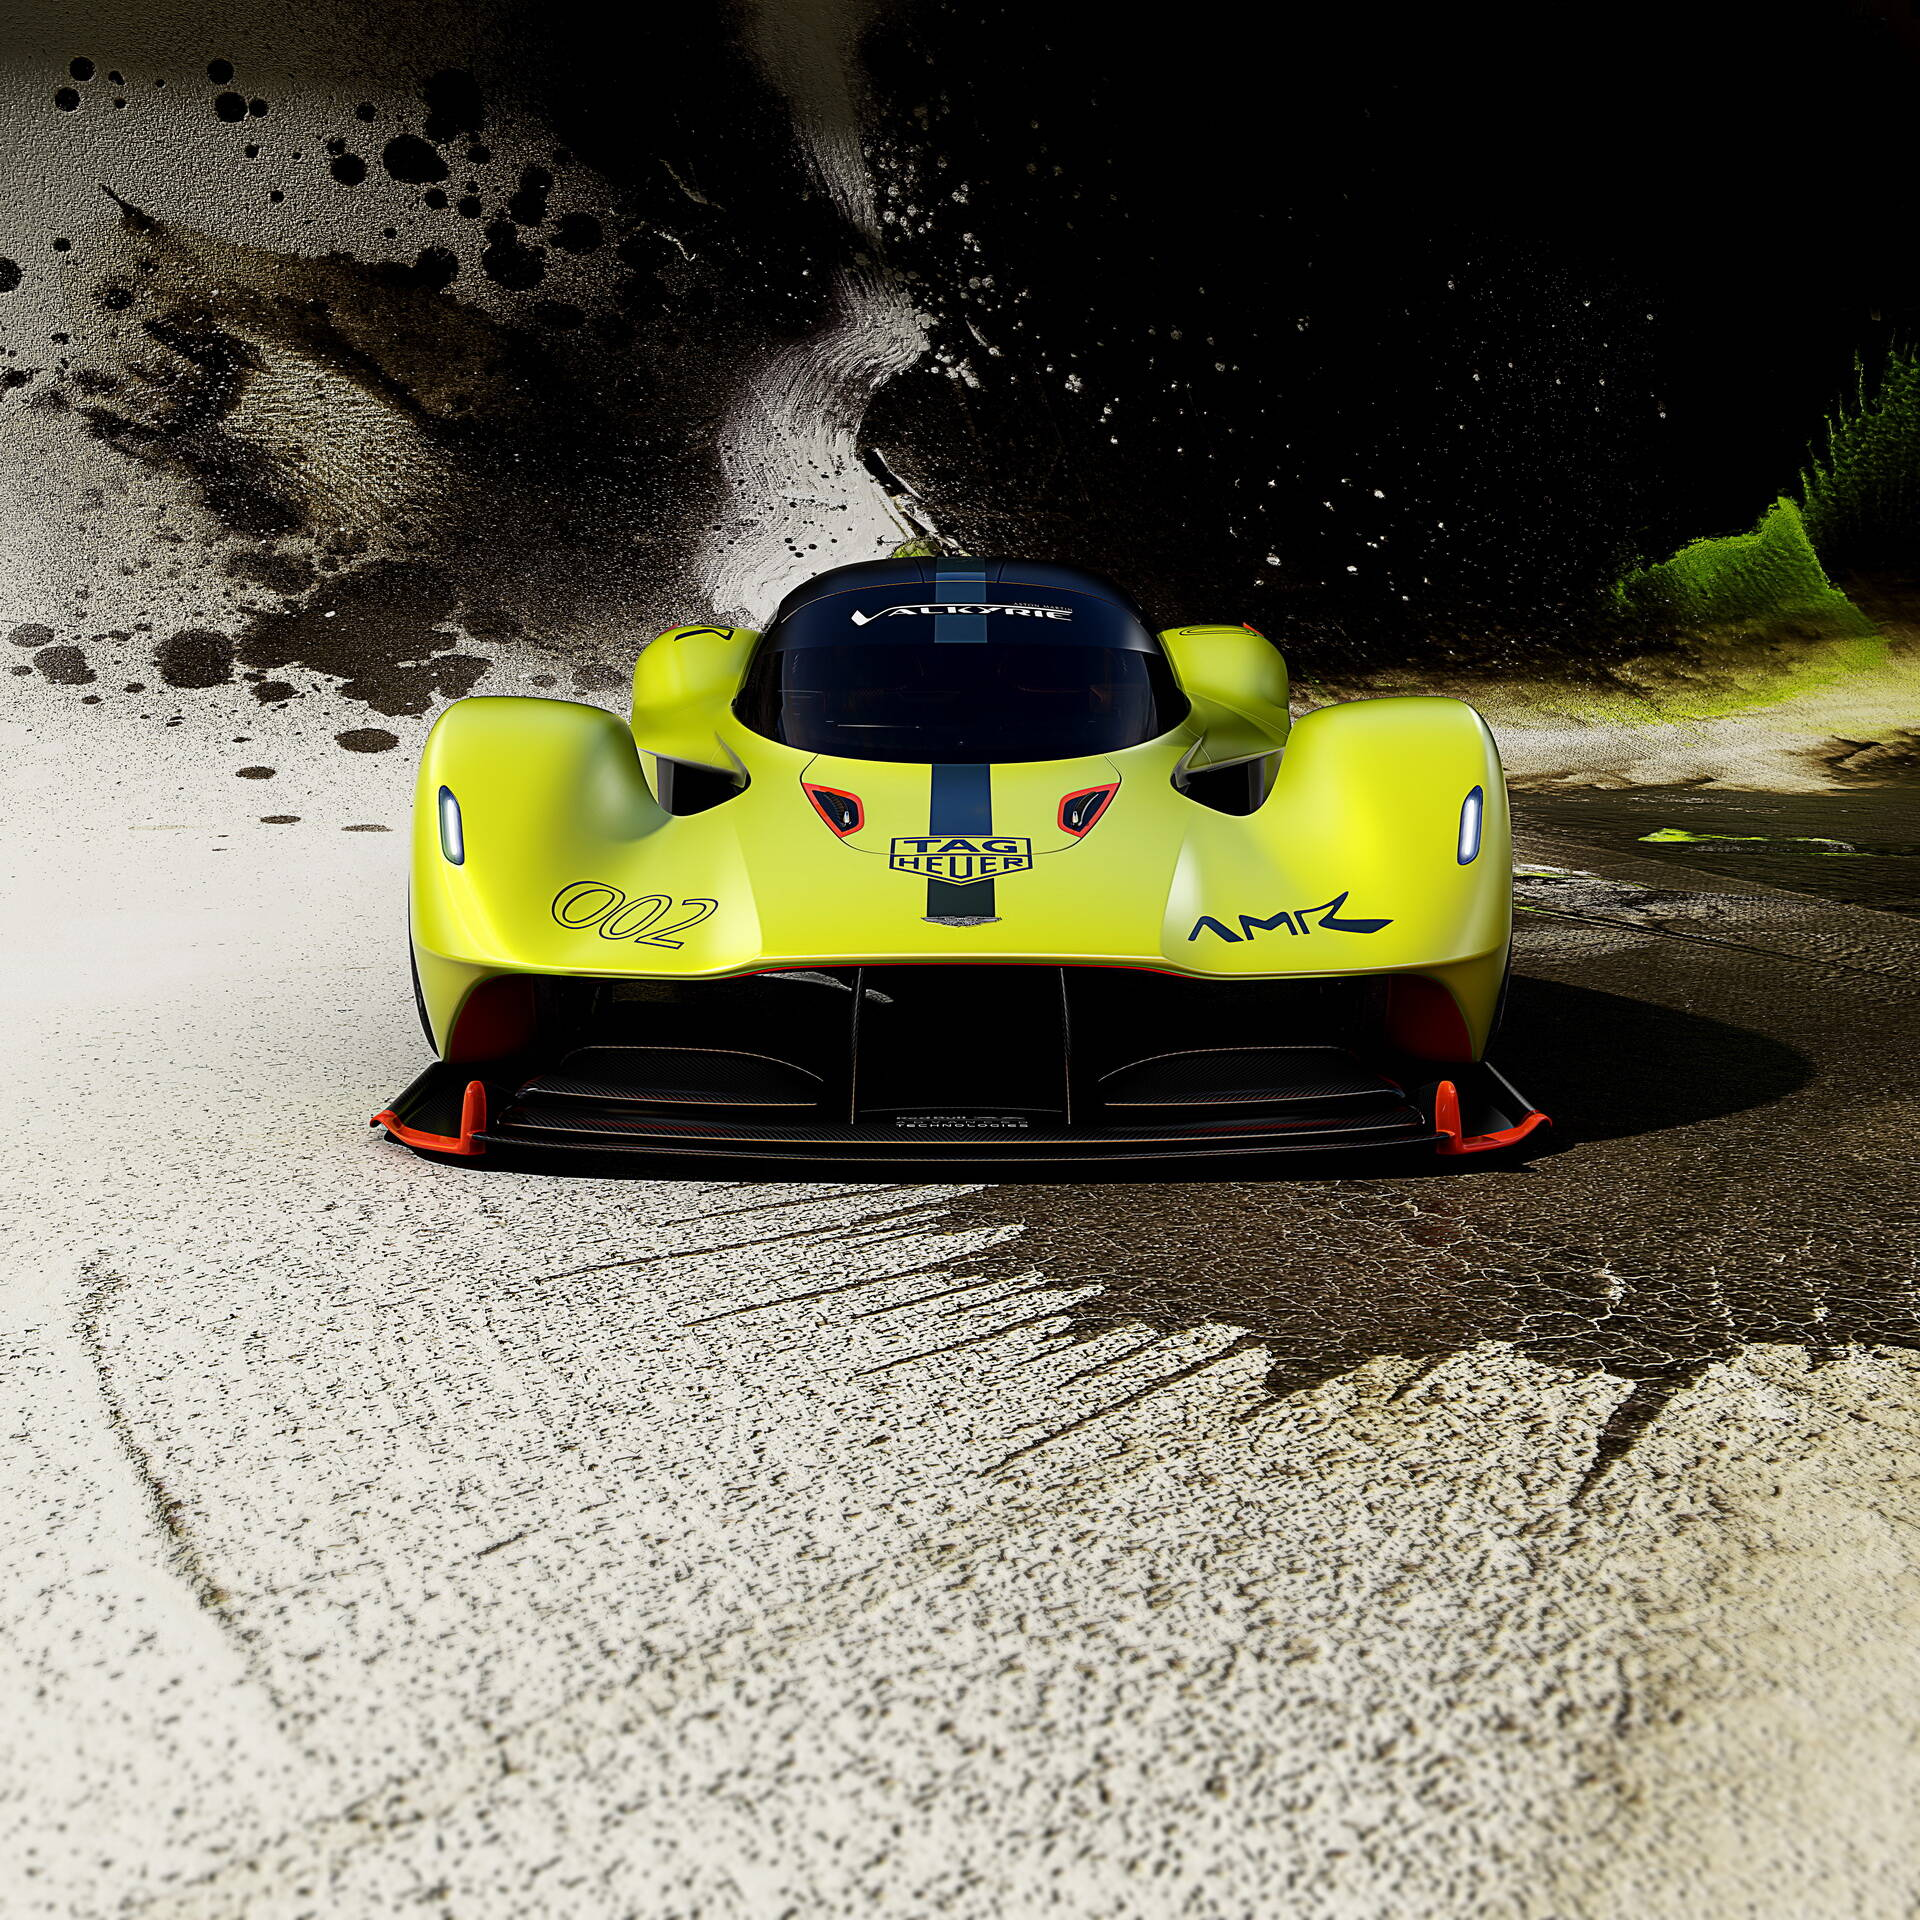 Aston Martin Valkyrie pro. Foto: Divulgação